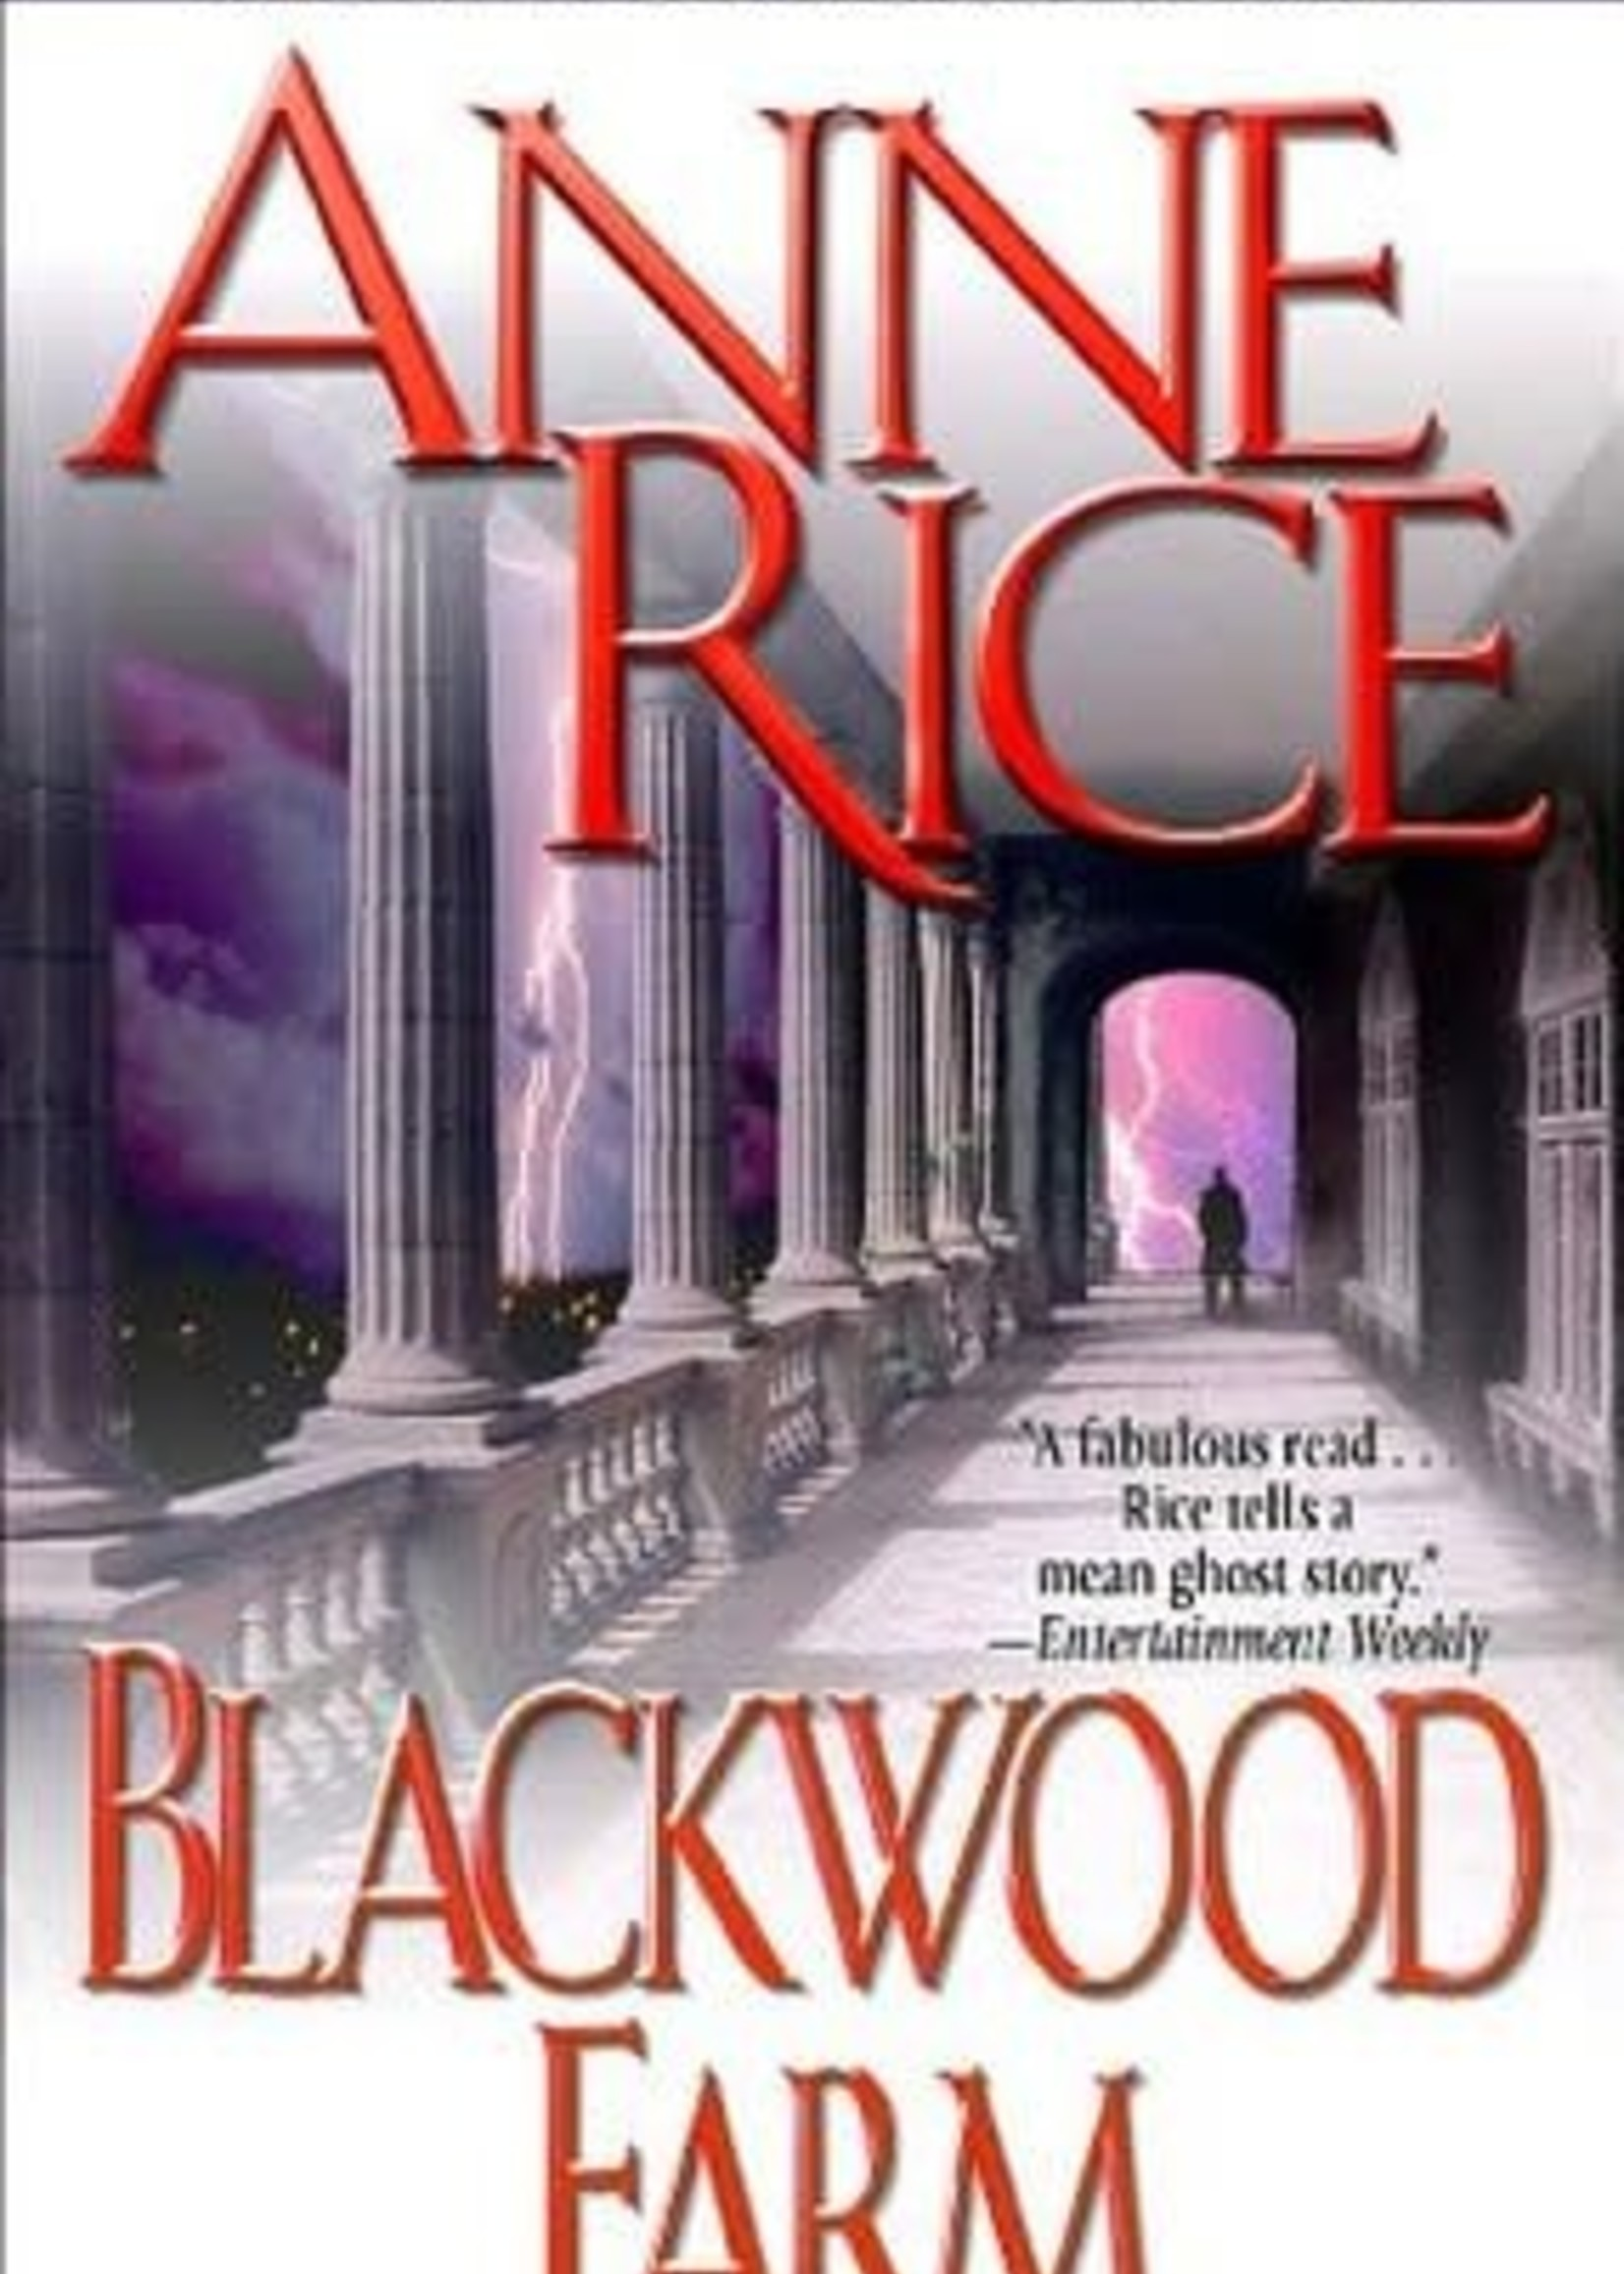 USED - Blackwood Farm by Anne Rice